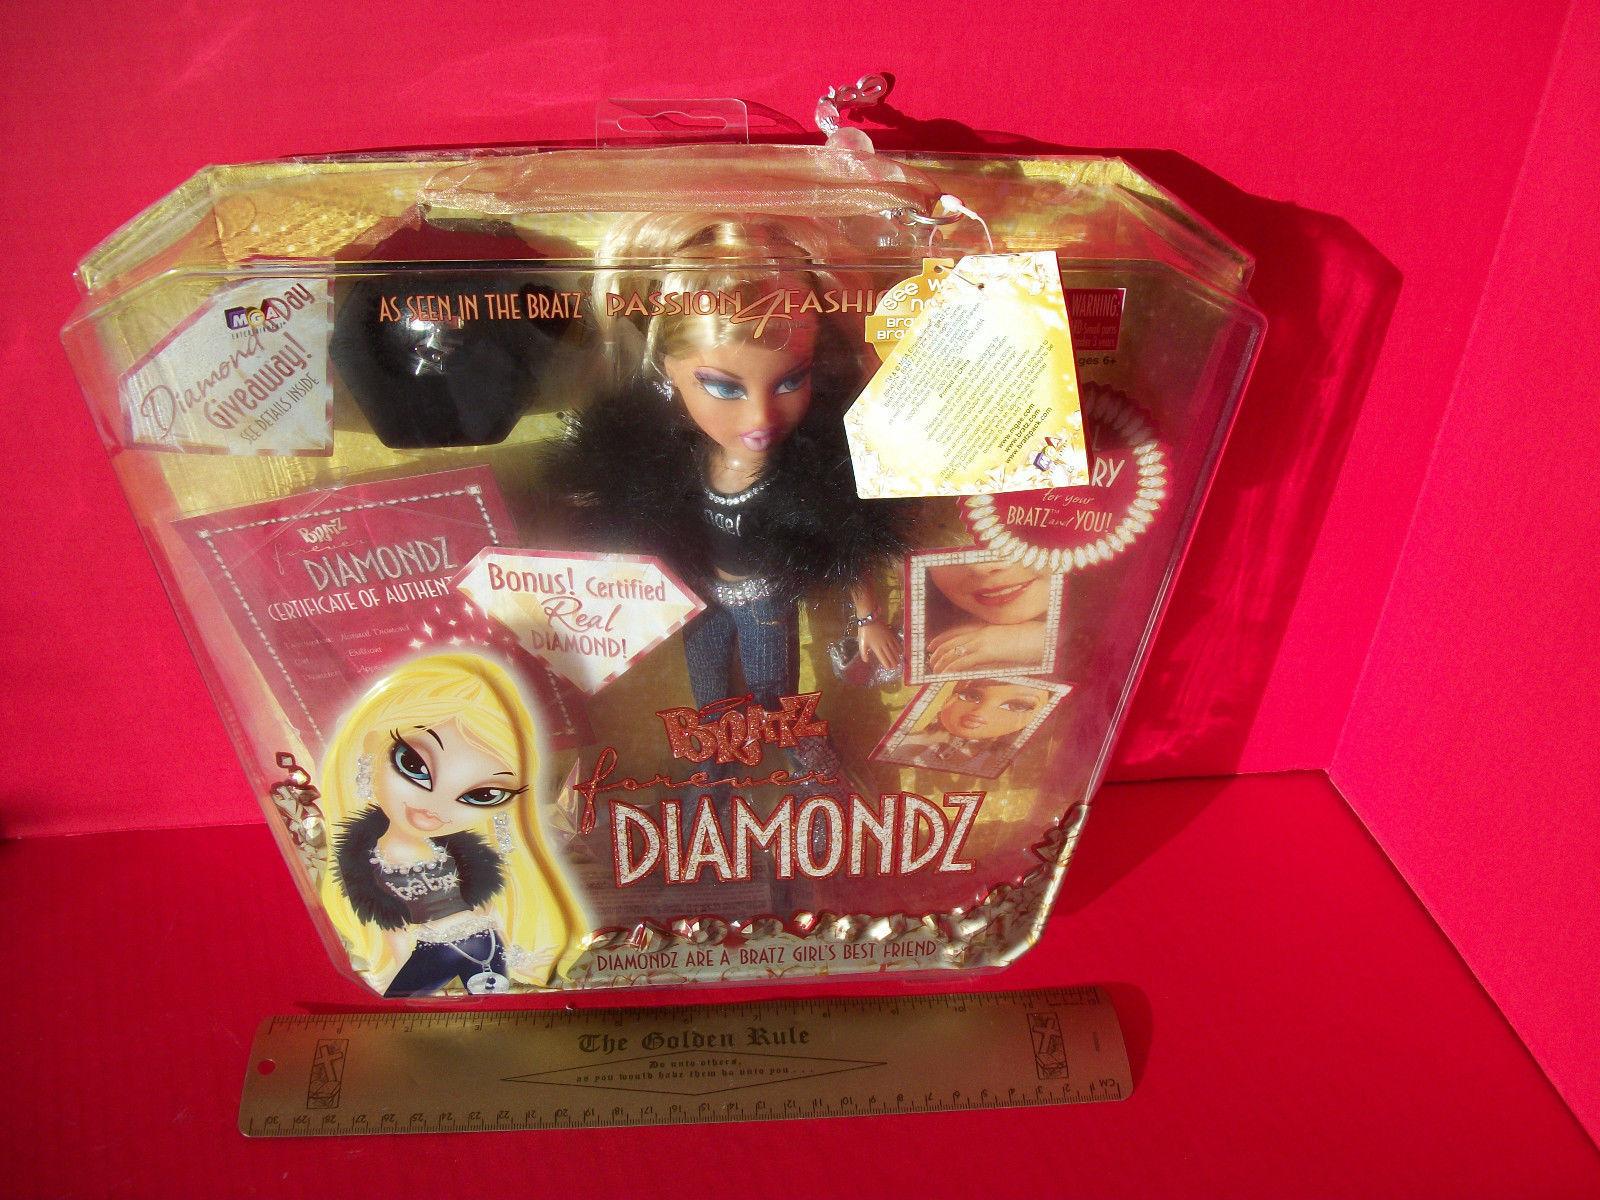 Bratz passion 4 fashion diamondz watch online 86